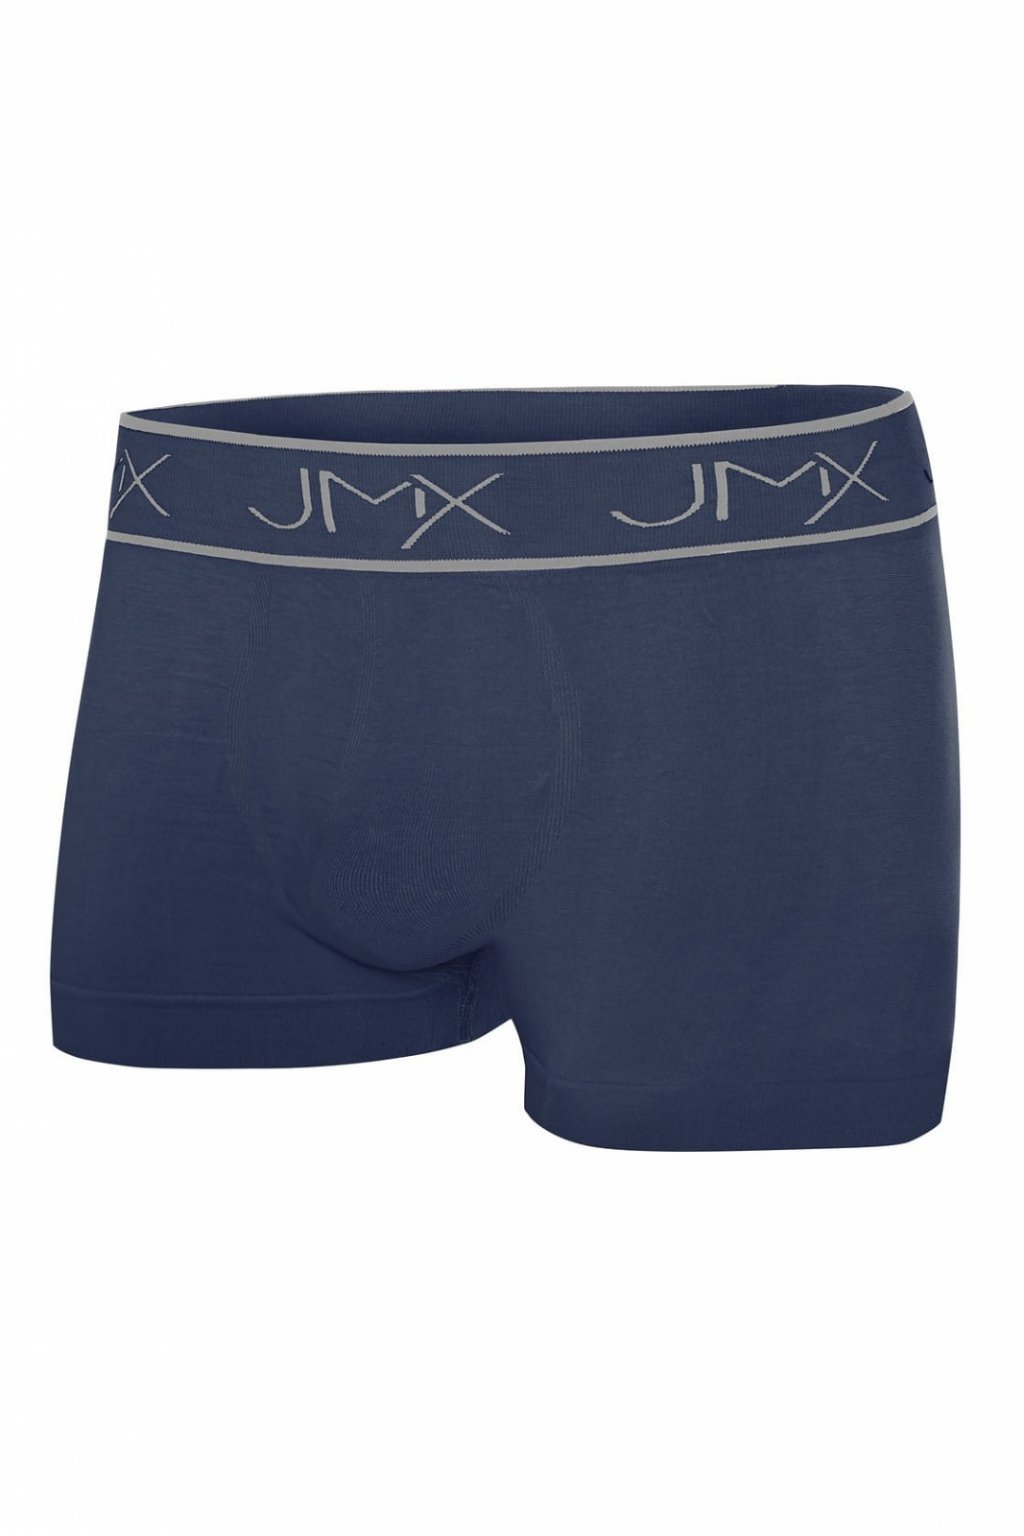 Boxerky Julimex Carbon Modrá